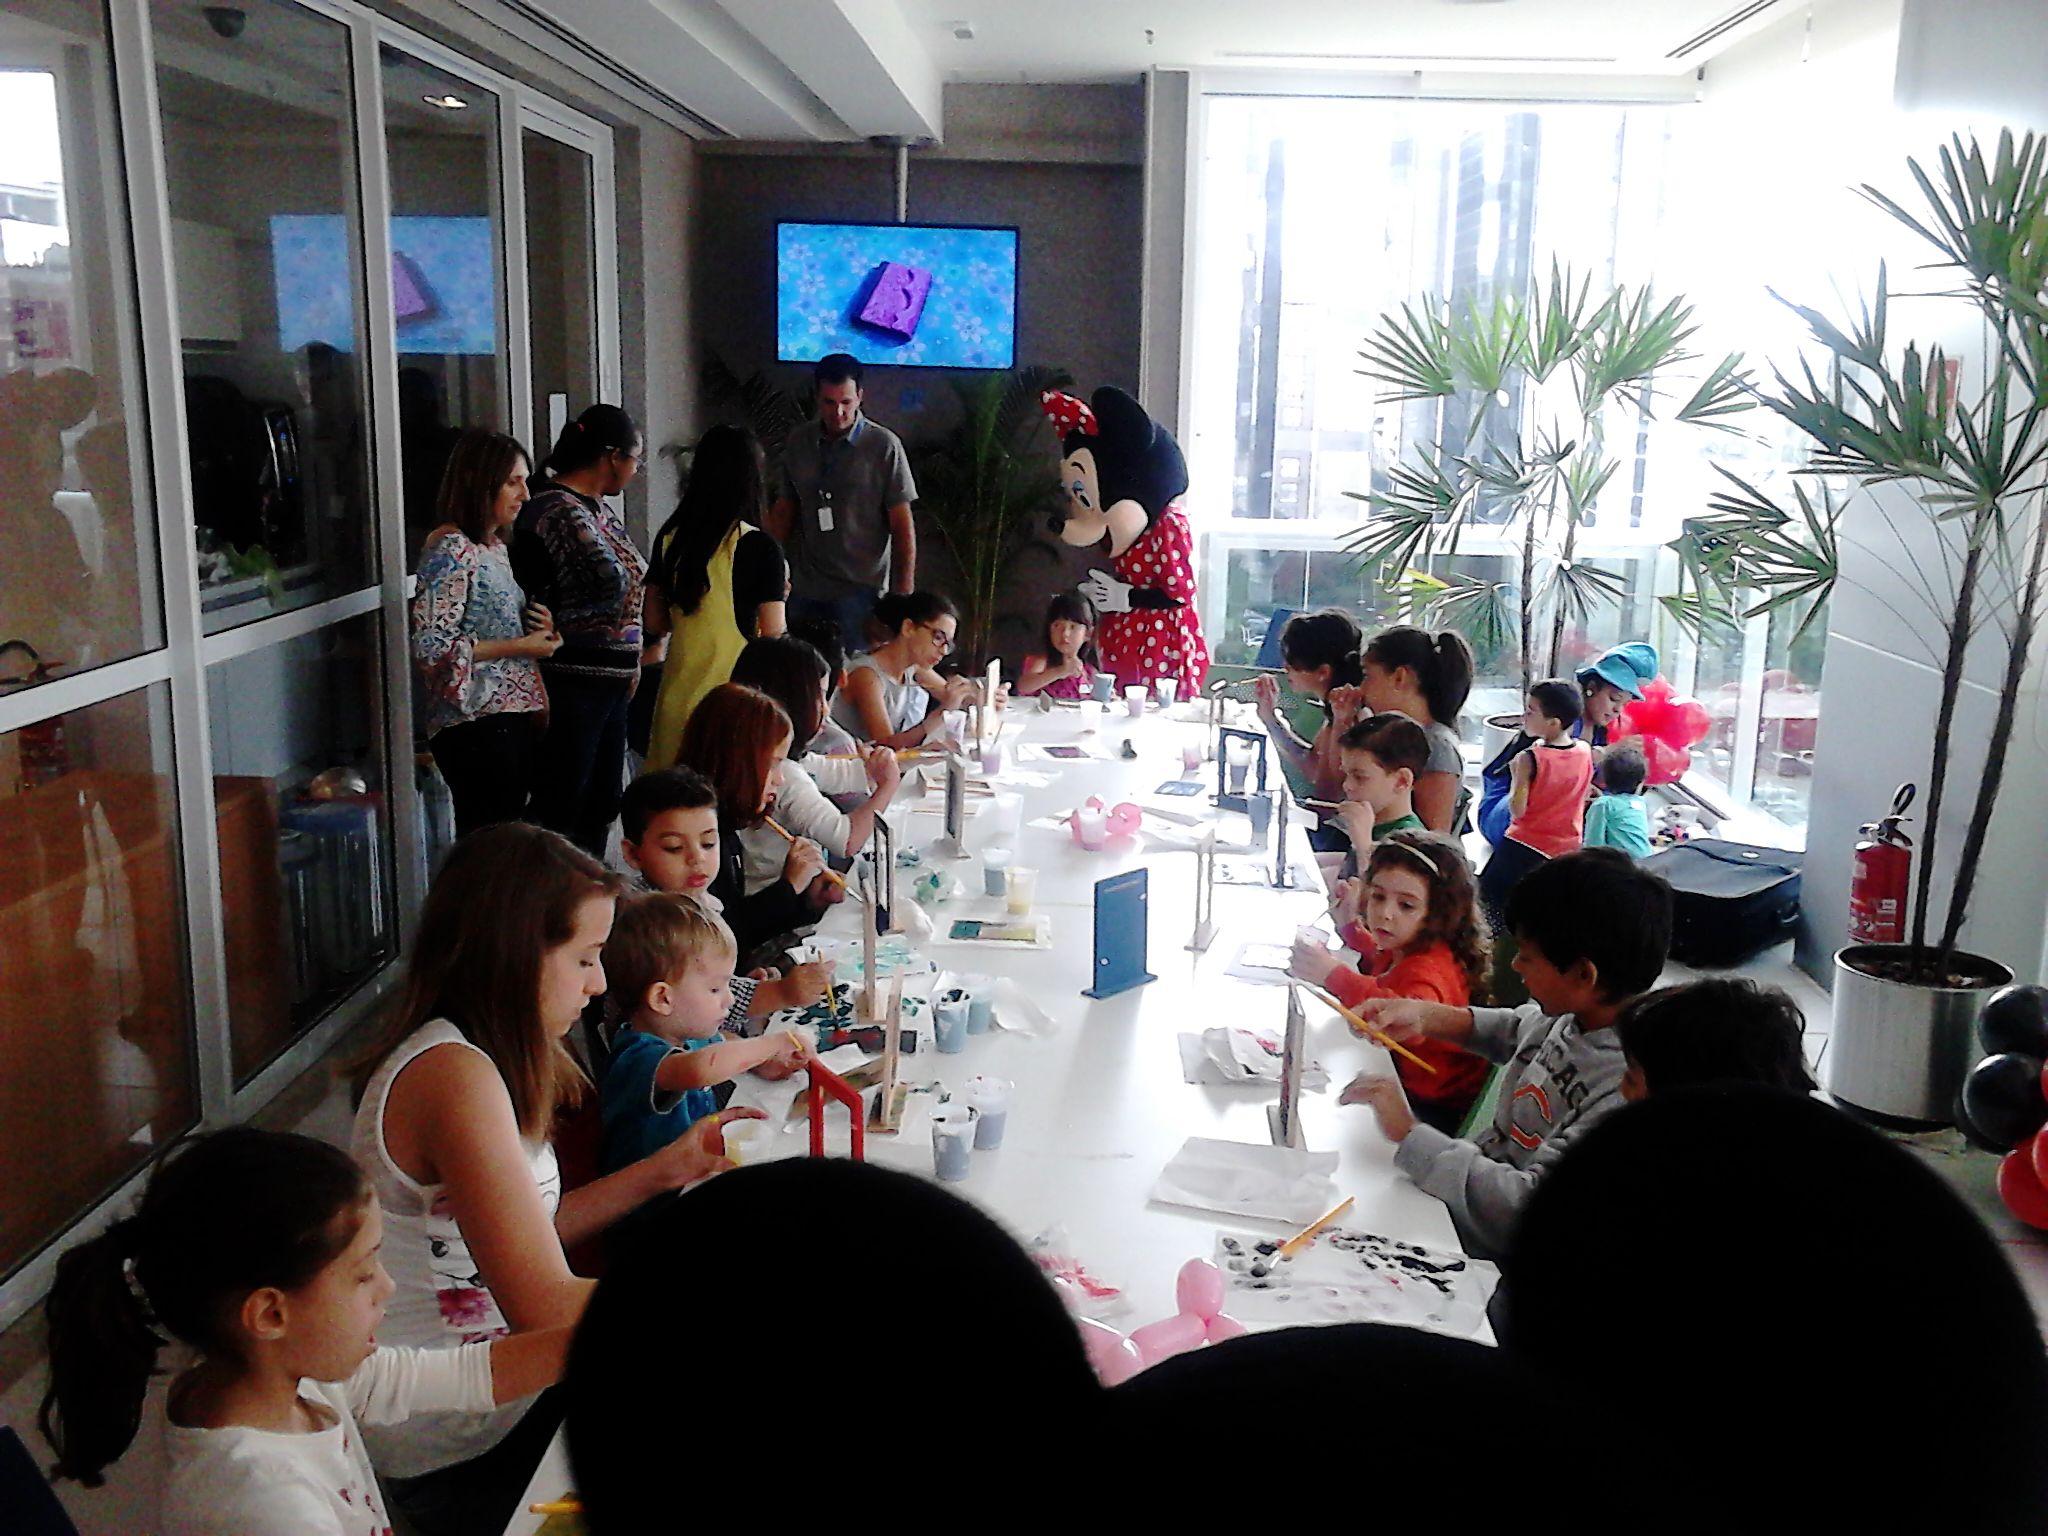 IMS Health do Brasil LTDA - 22-01-2016 (1)